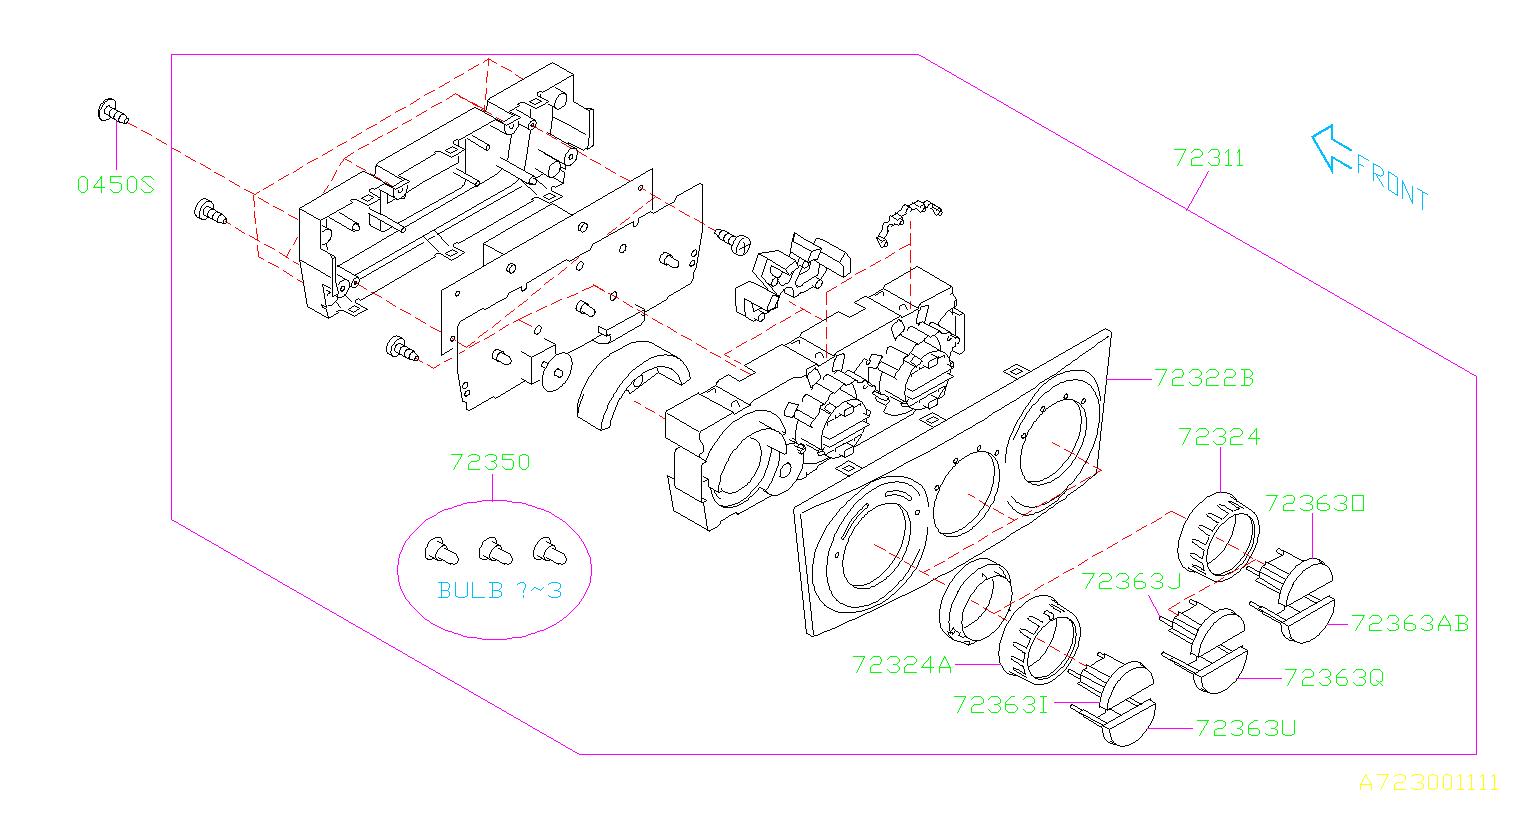 Subaru Forester Control Panel Auto Air Conditioner  Panel